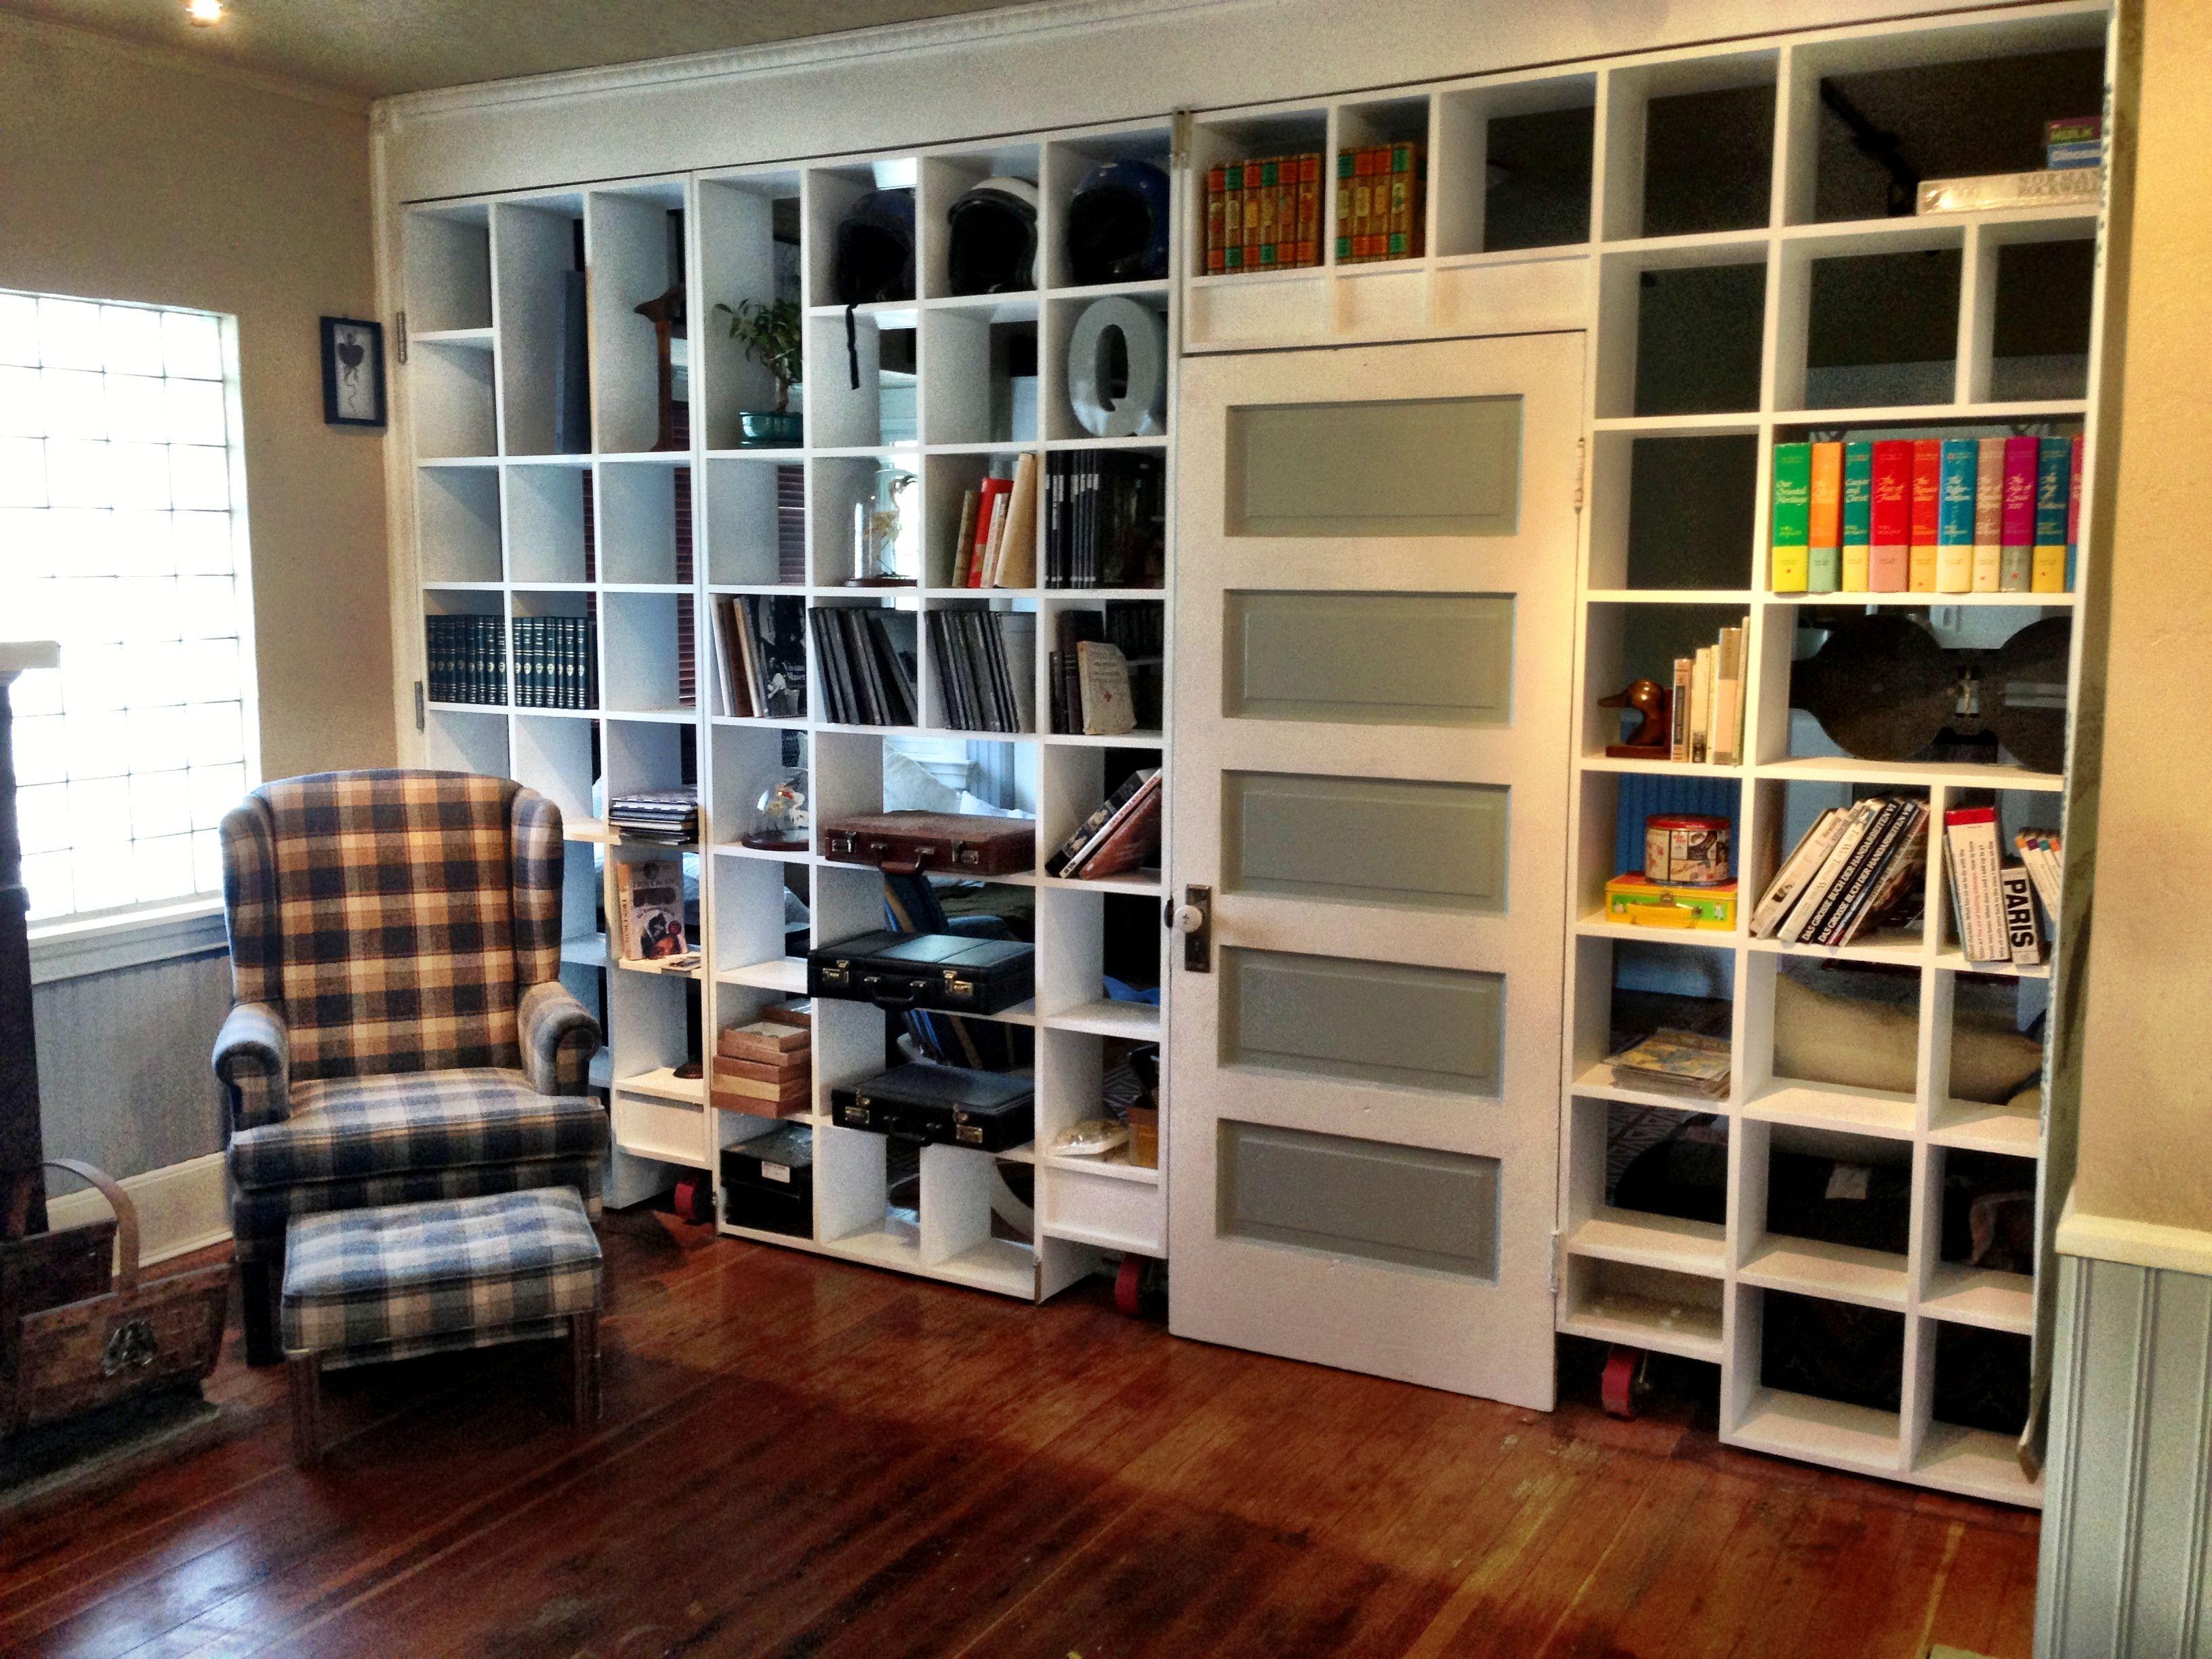 friends bookshelf room divider | c r e a t e | pinterest